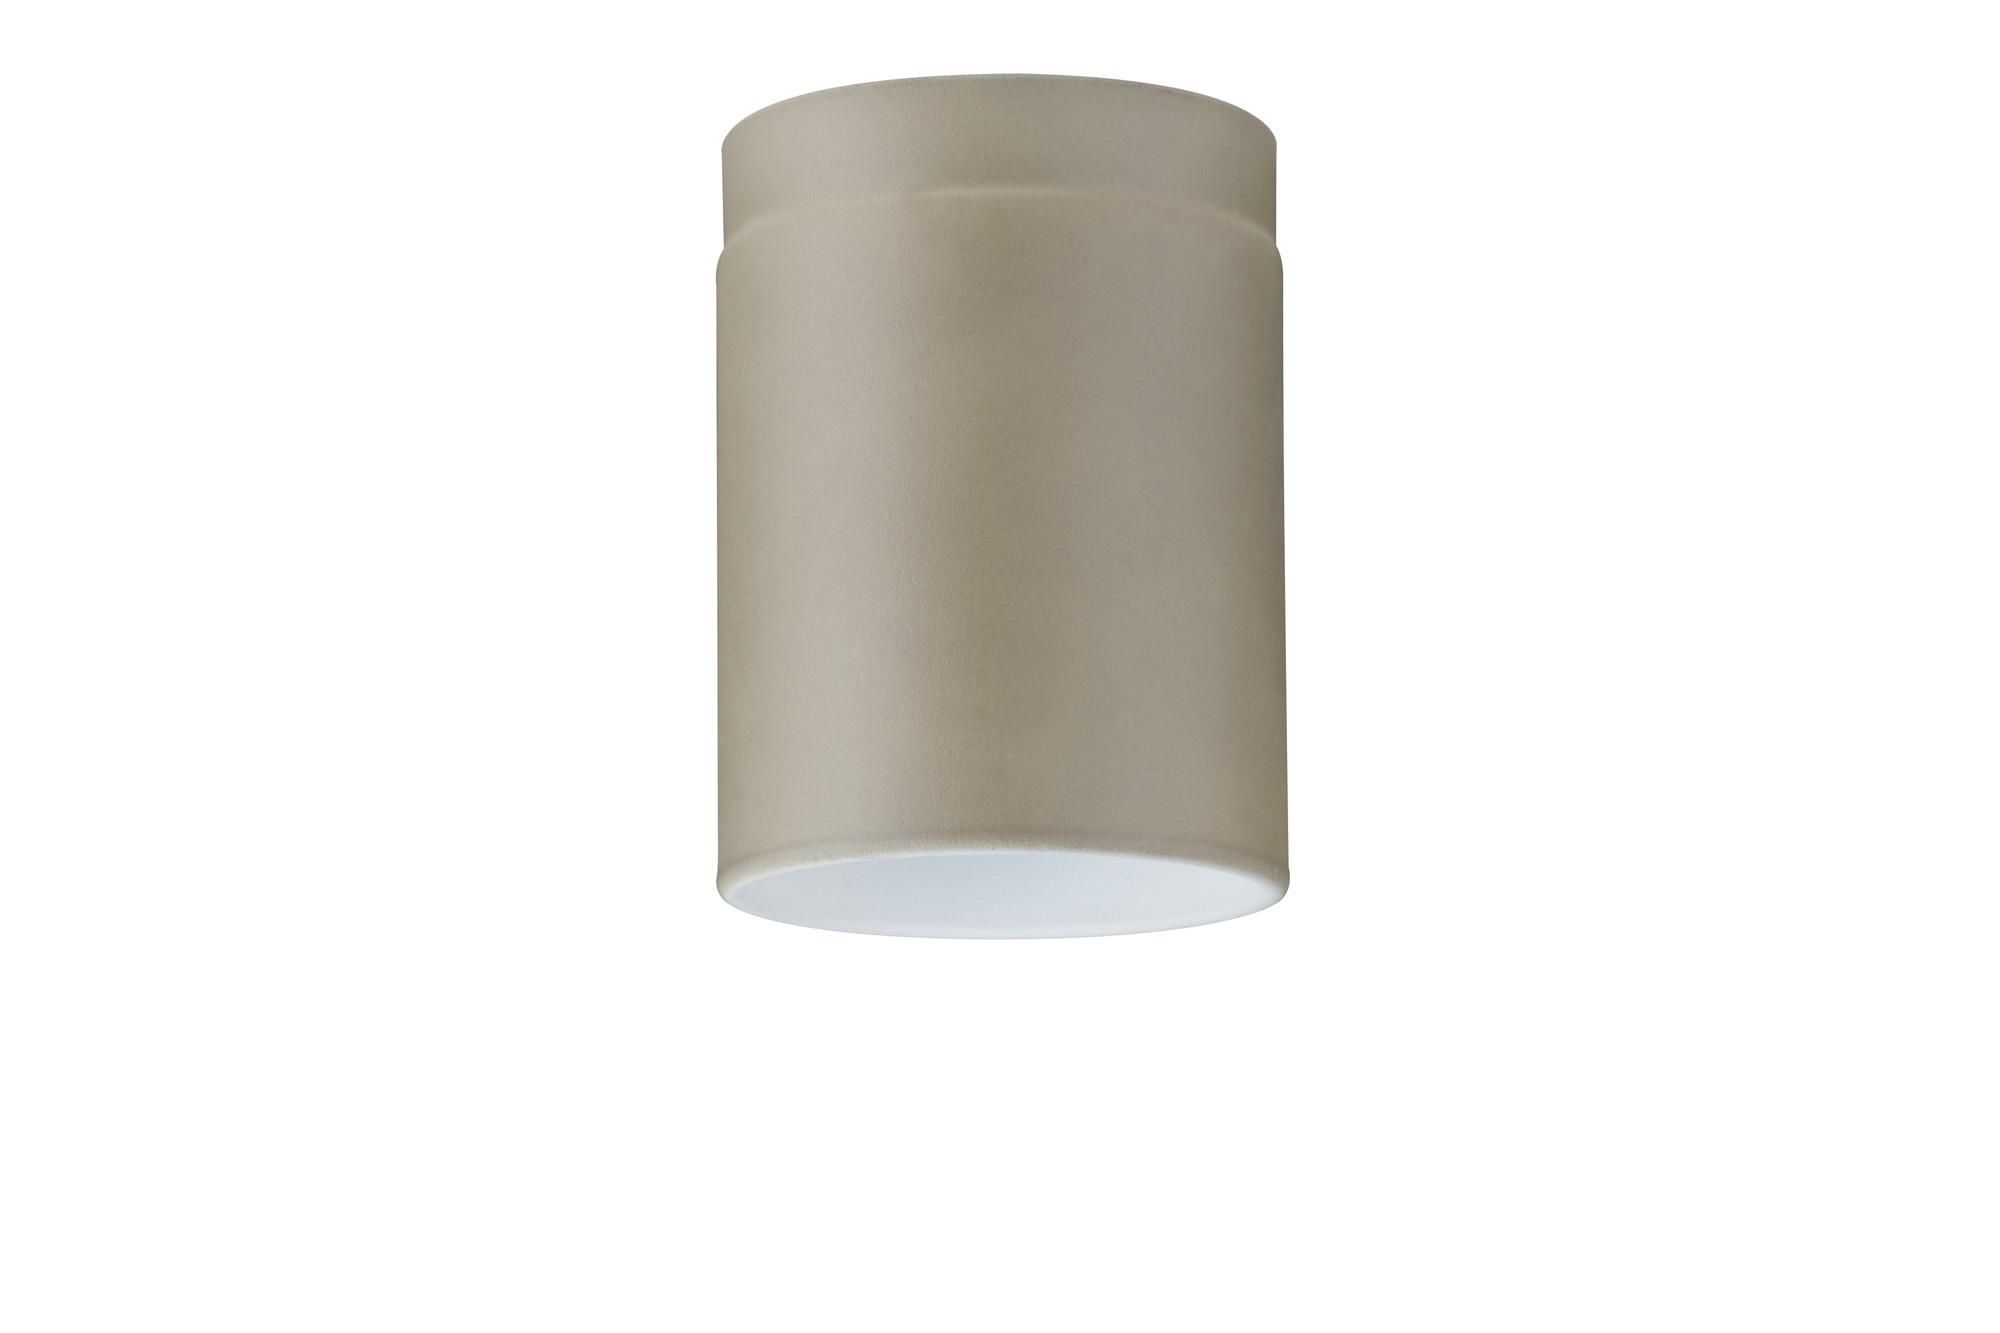 Paulmann. 92577 Плафон для DecoSystems Tube Mini, brown, стекло